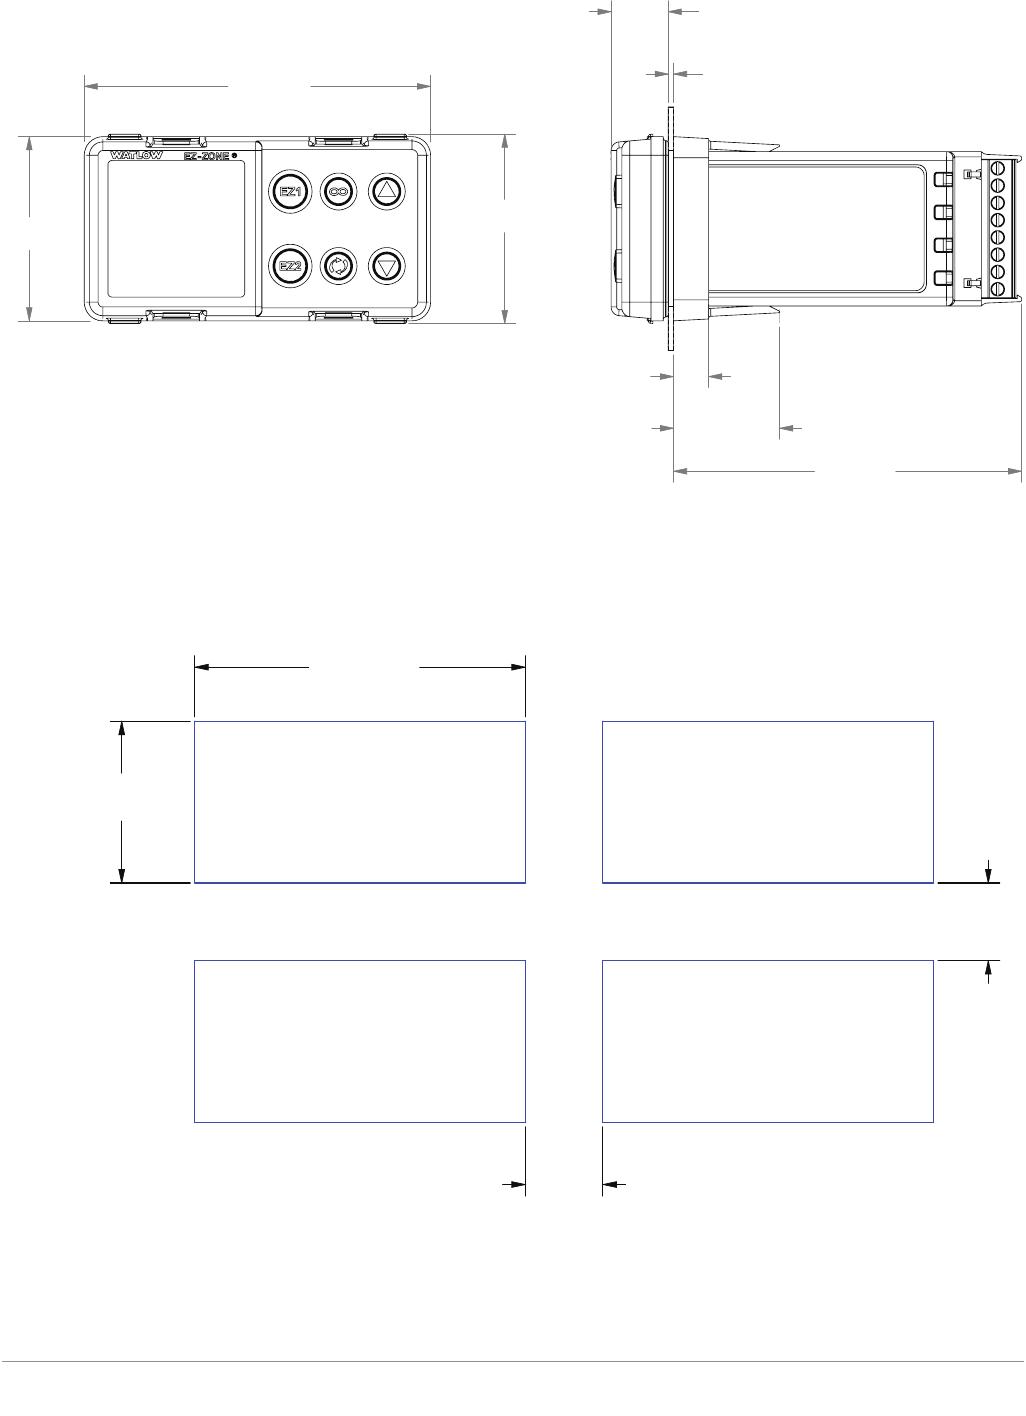 ez wiring harness 12 circuit diagram